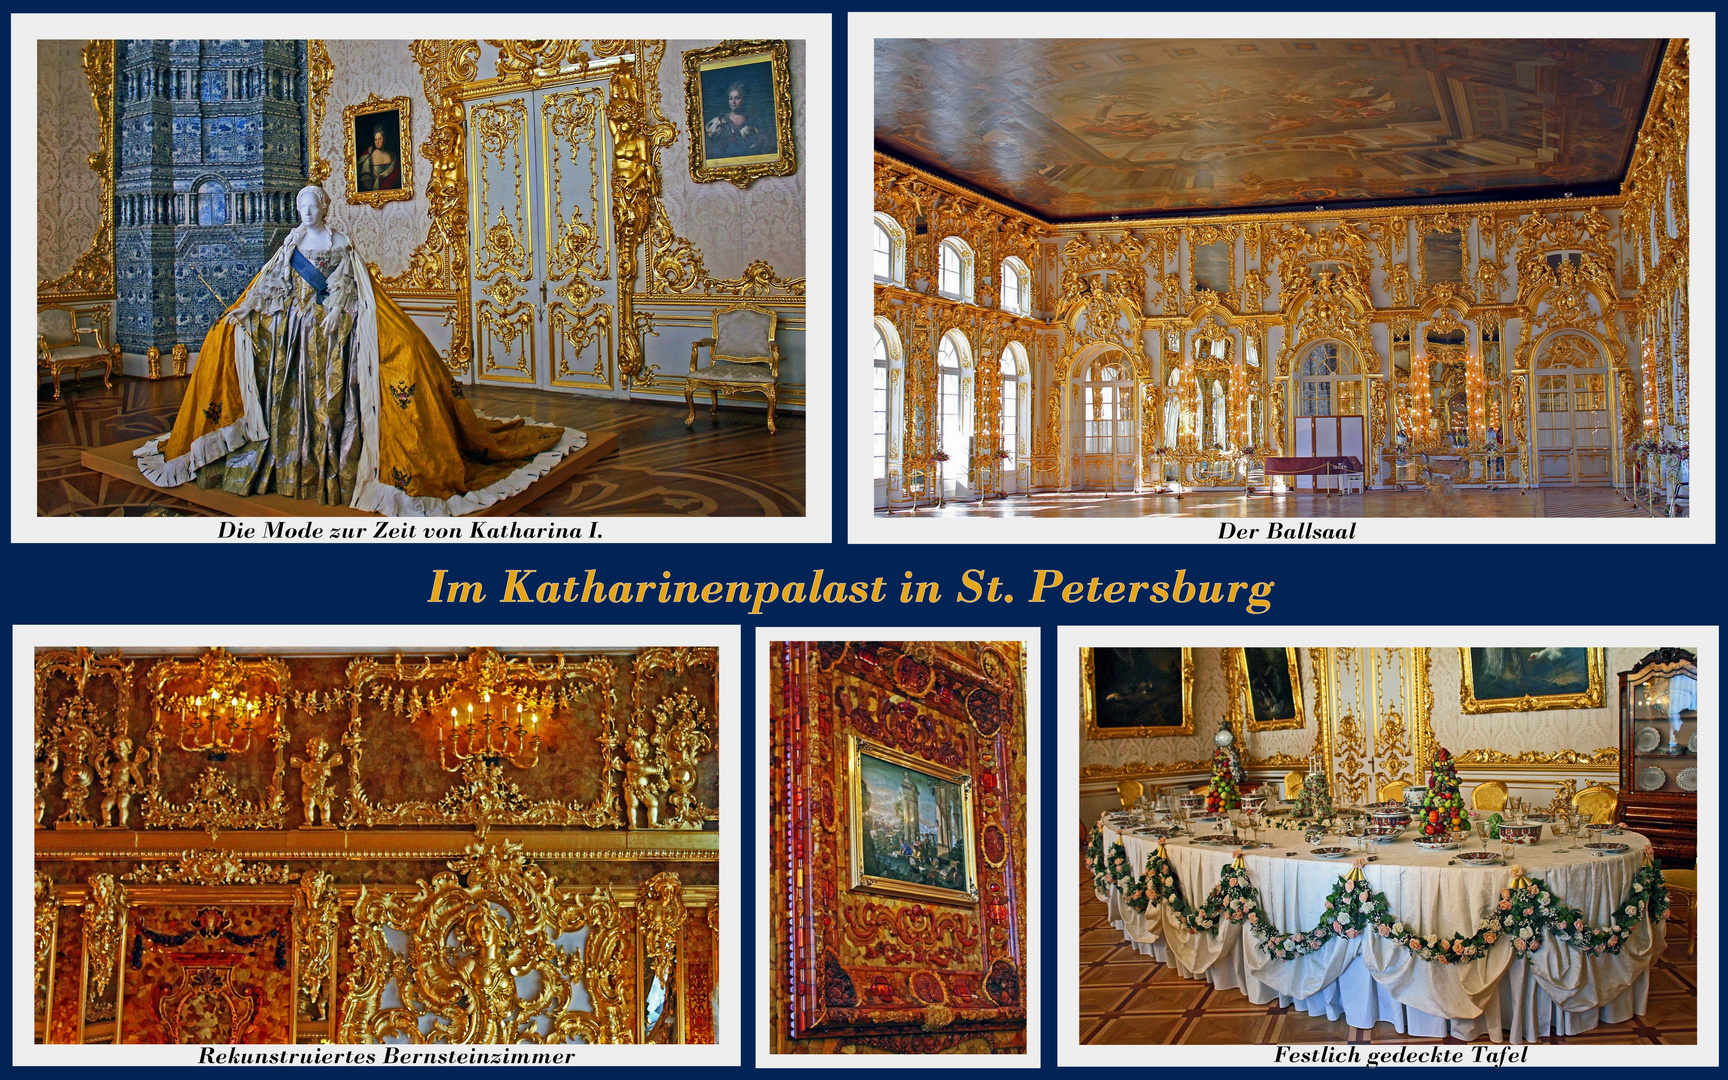 St. Petersburg, Katharinenpalast